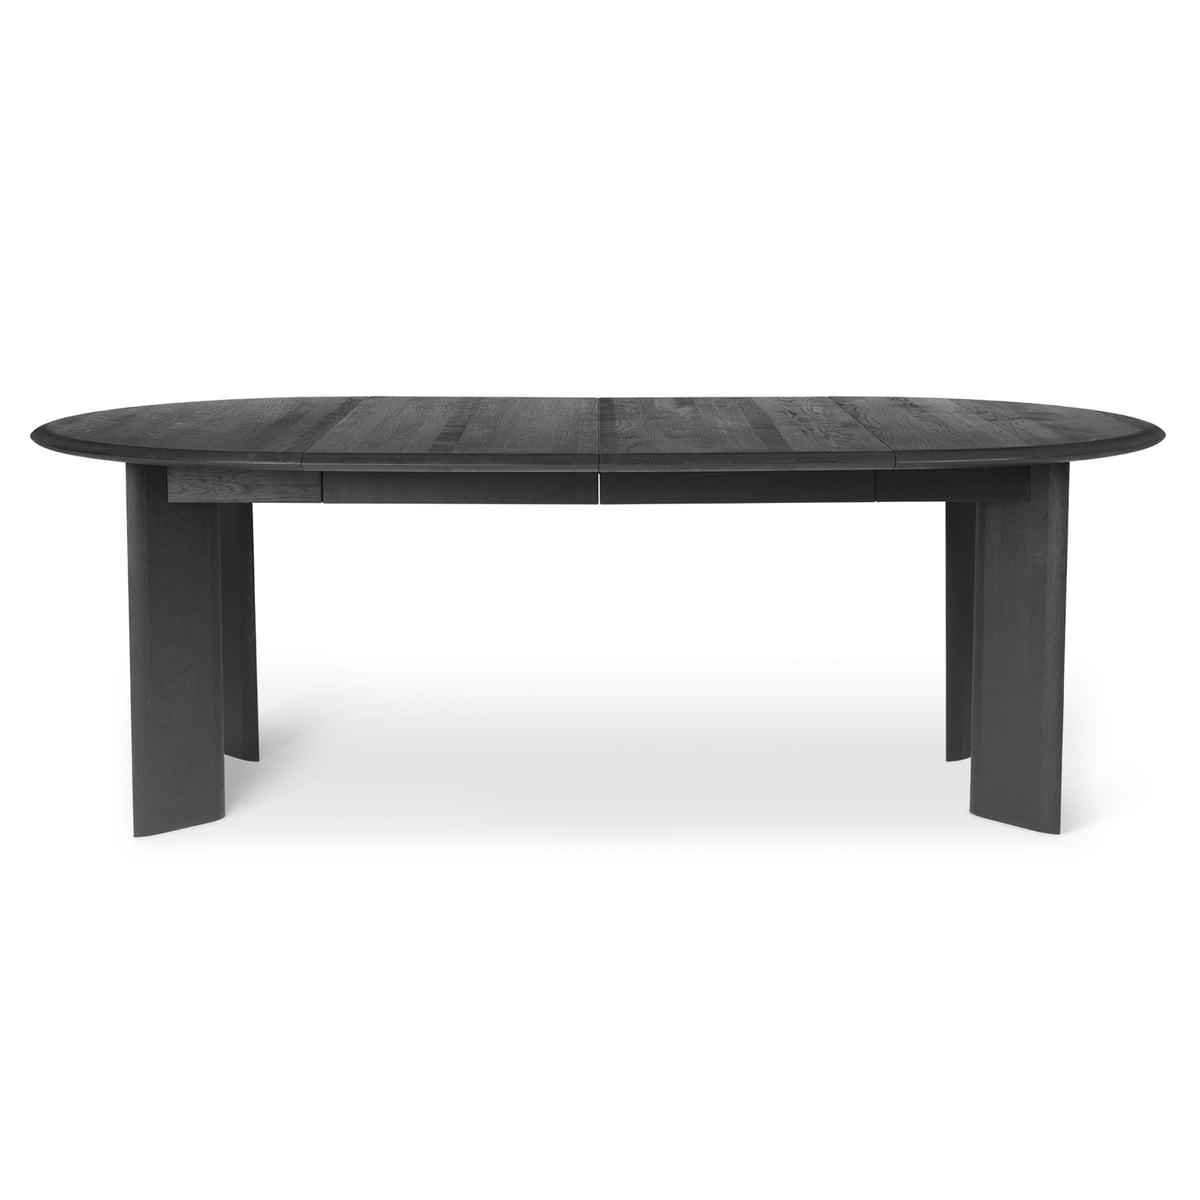 - Ferm Living - Bevel Extending Table Connox